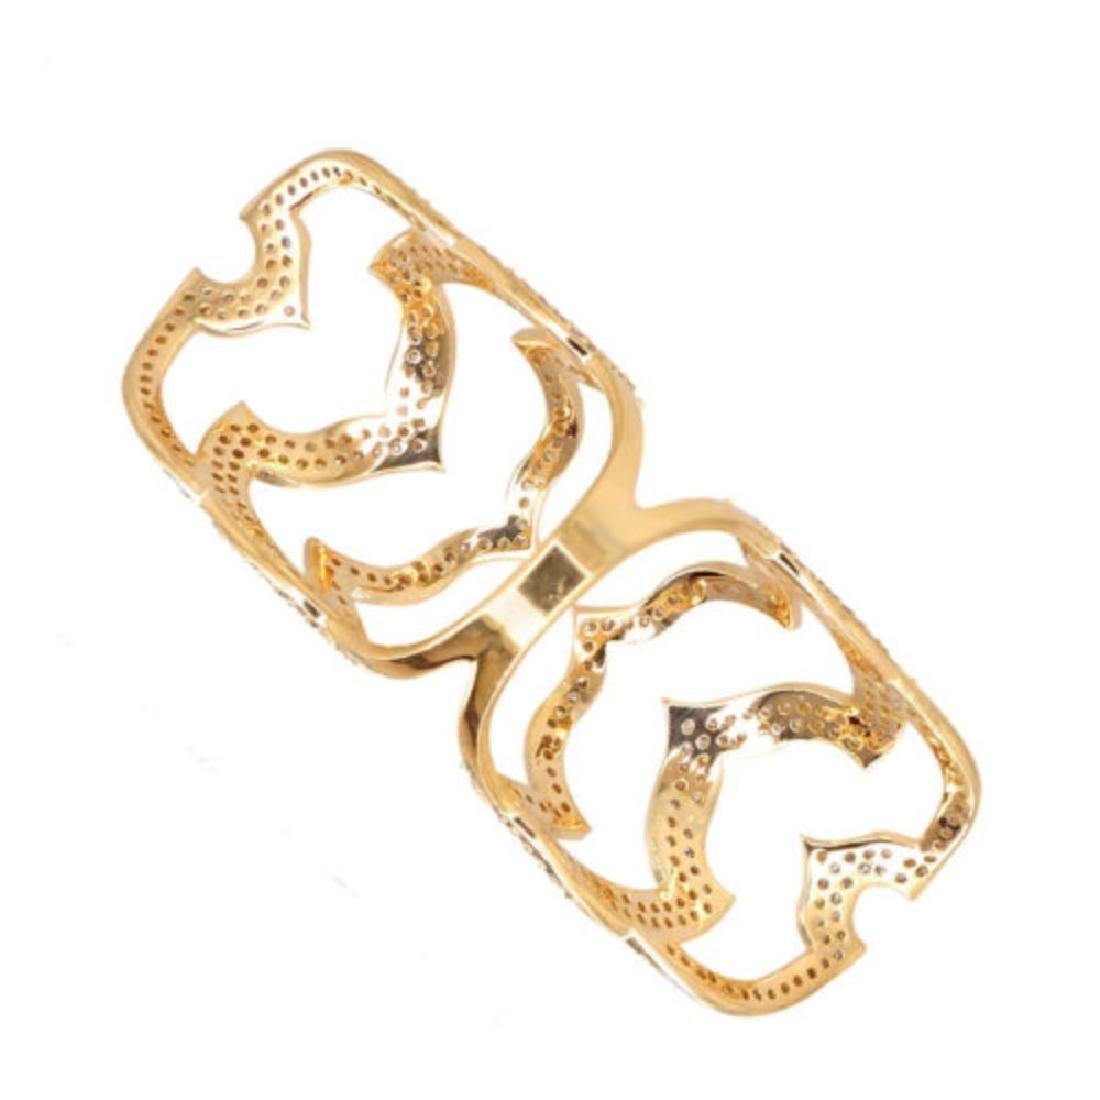 18k Yellow Gold 1.97 Ct Natural Diamond Pave Ring - 4